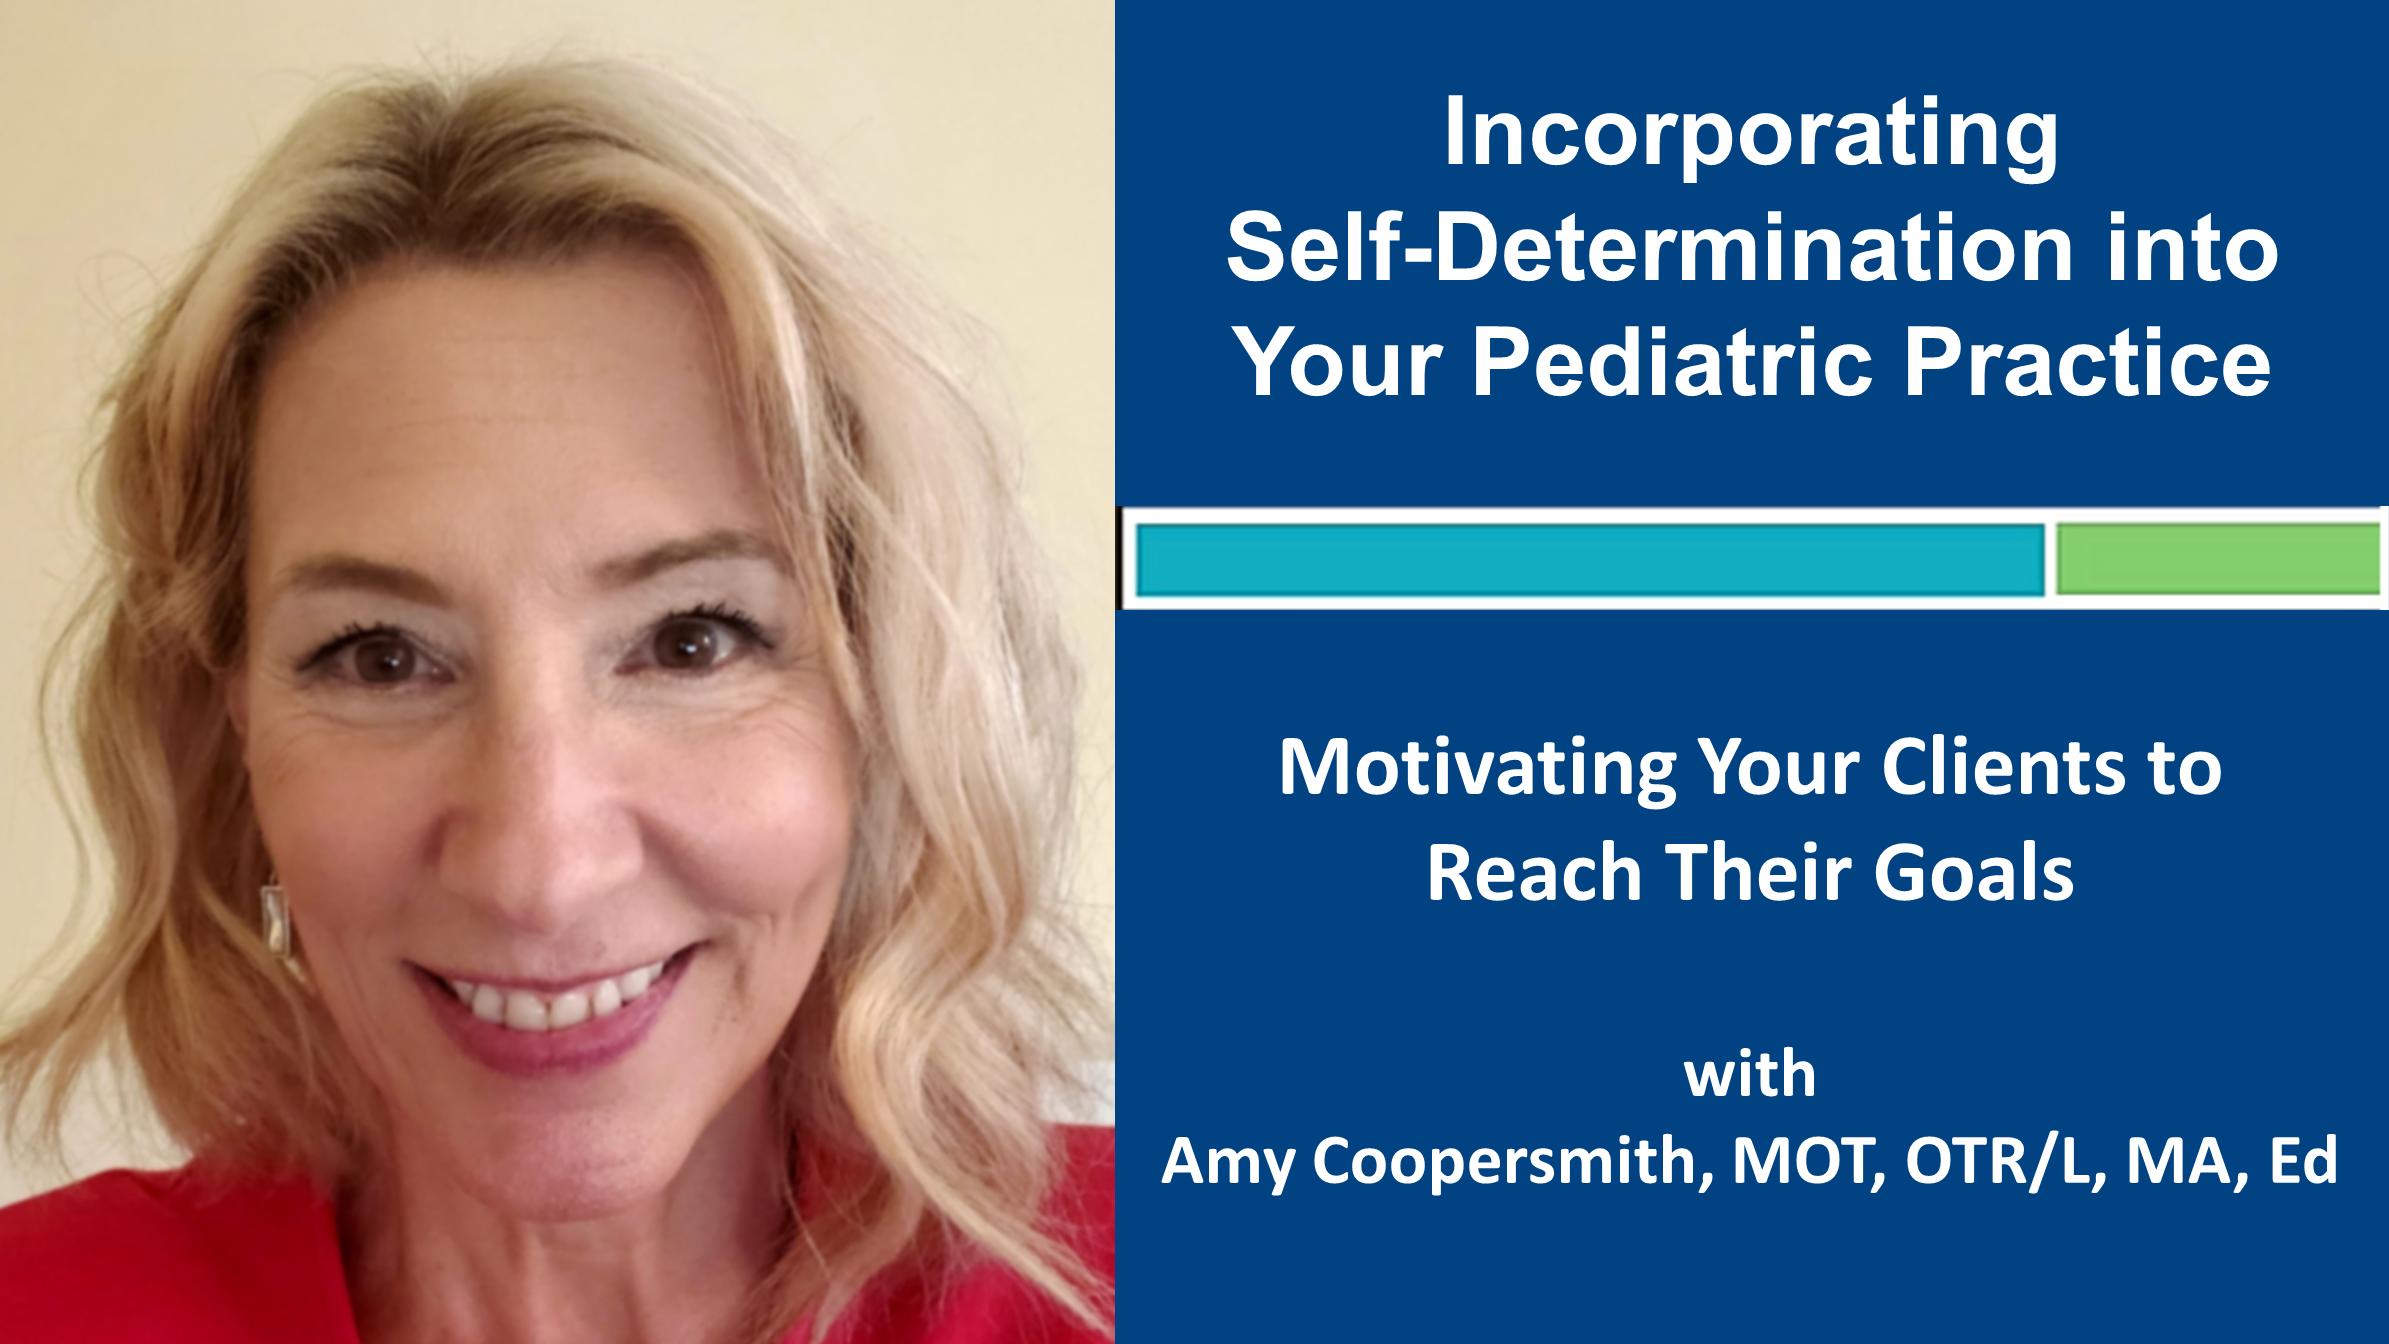 Webinar 1: Incorporating Self-determination into Your Pediatric Practice